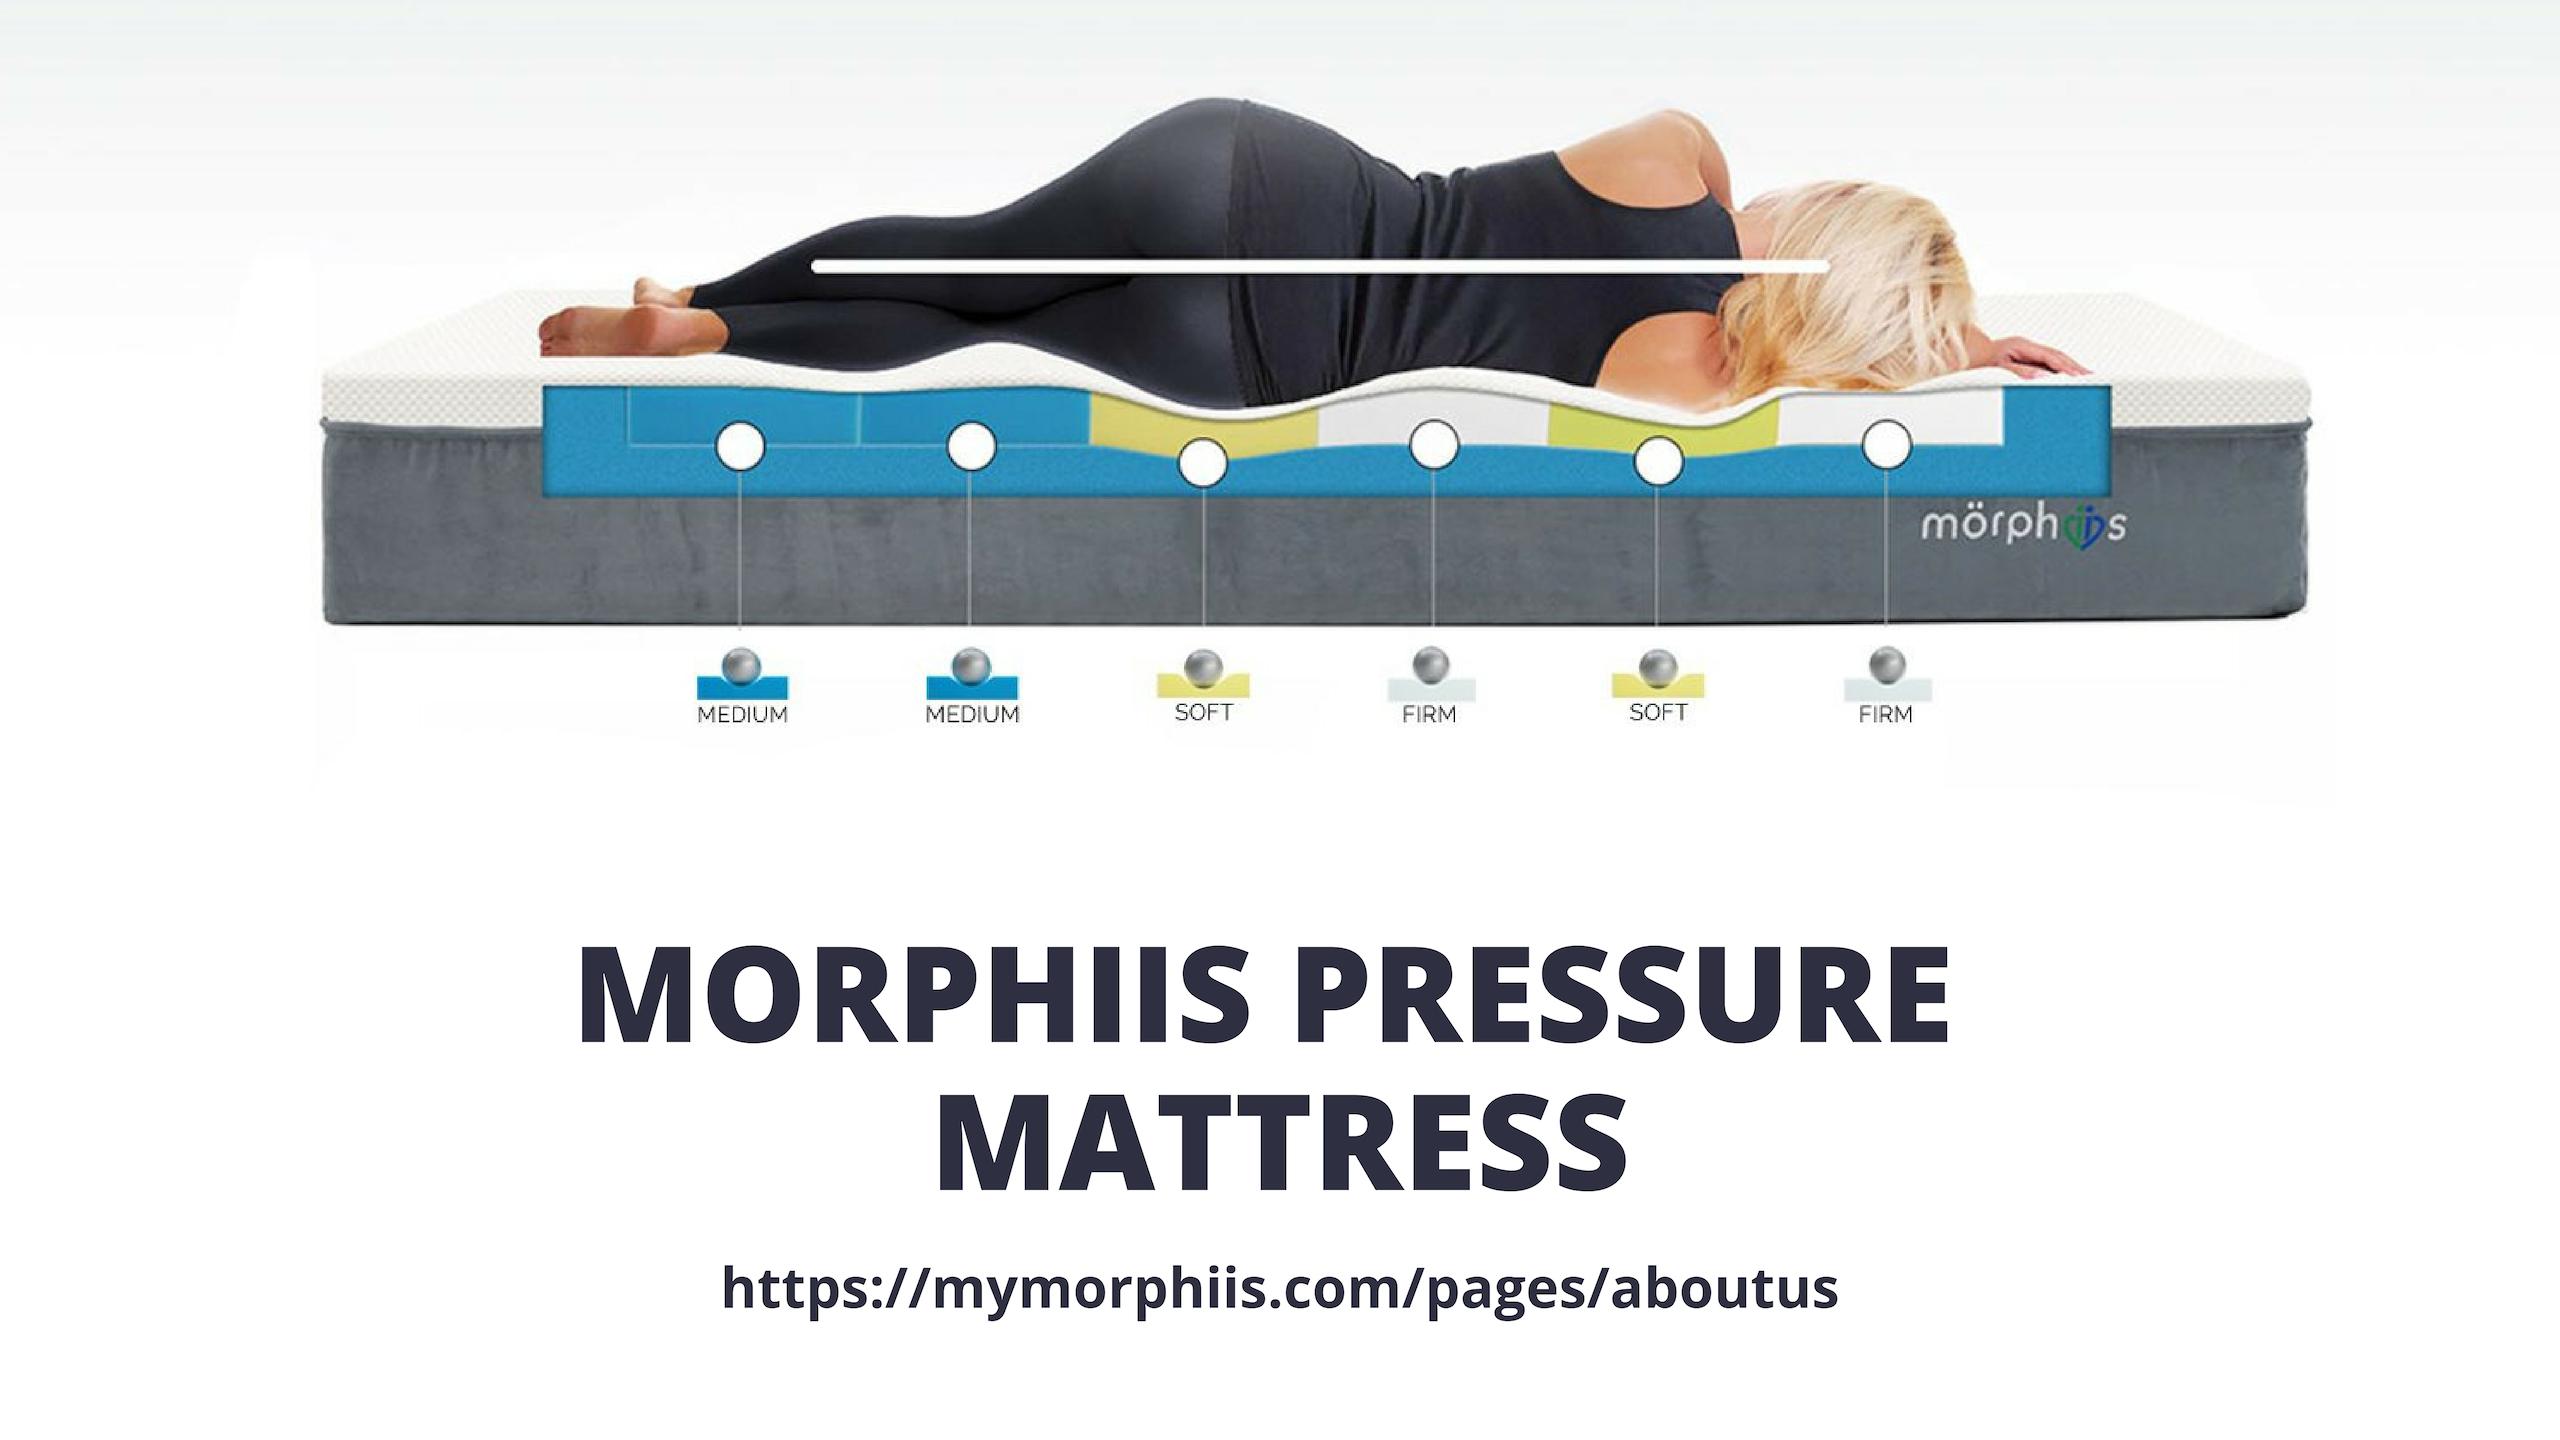 Morphiis Pressure Mattress